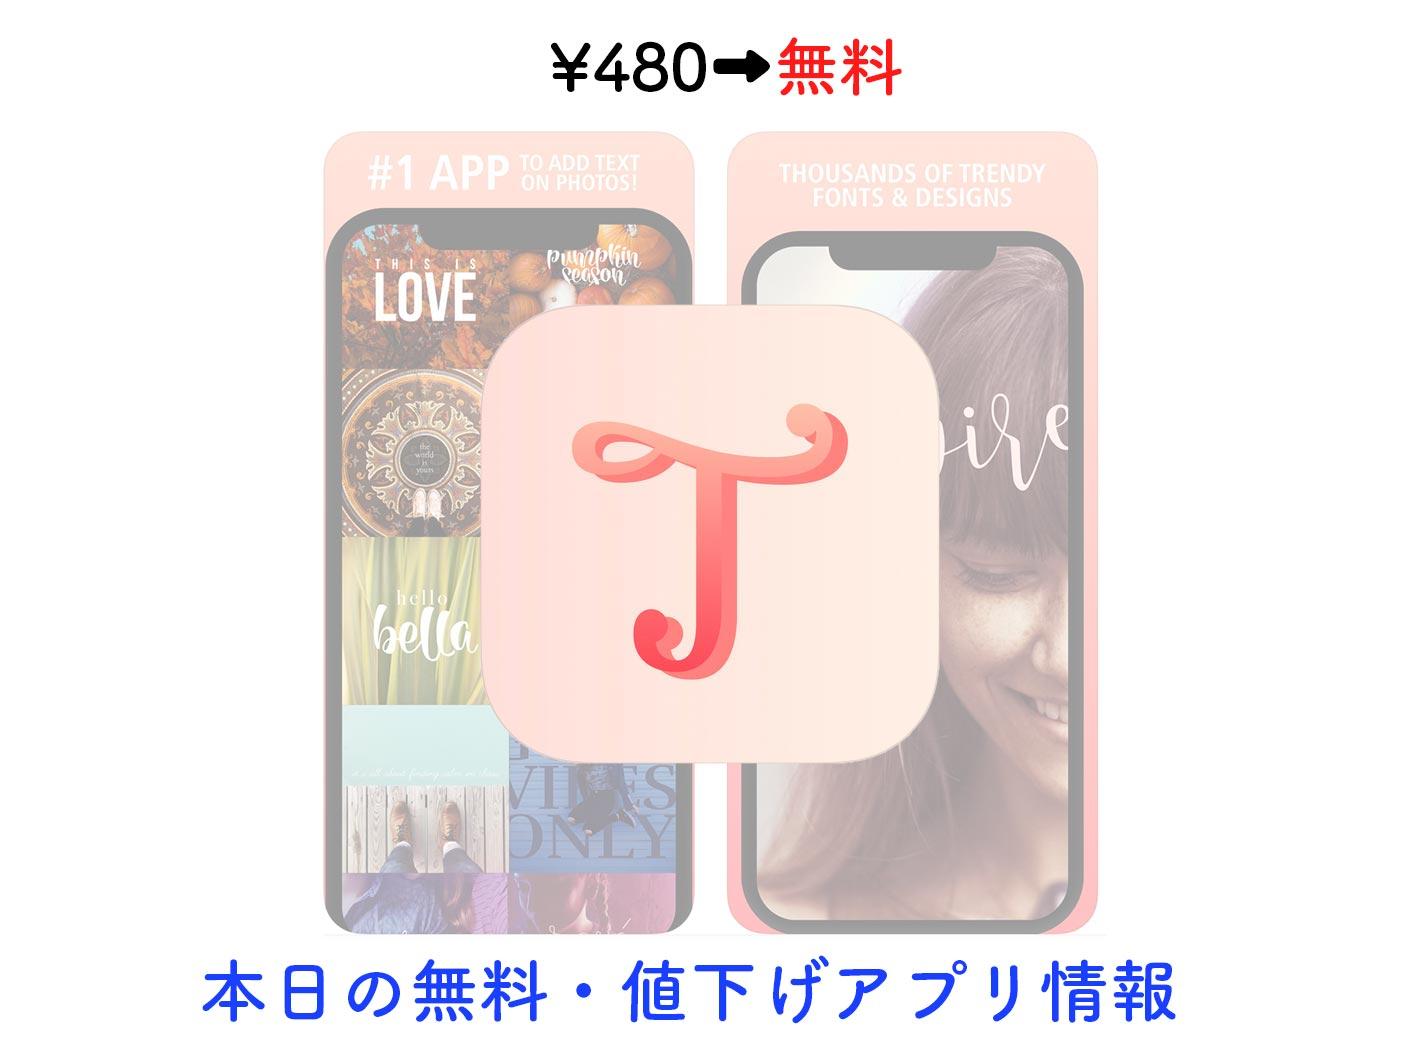 Appsale0713